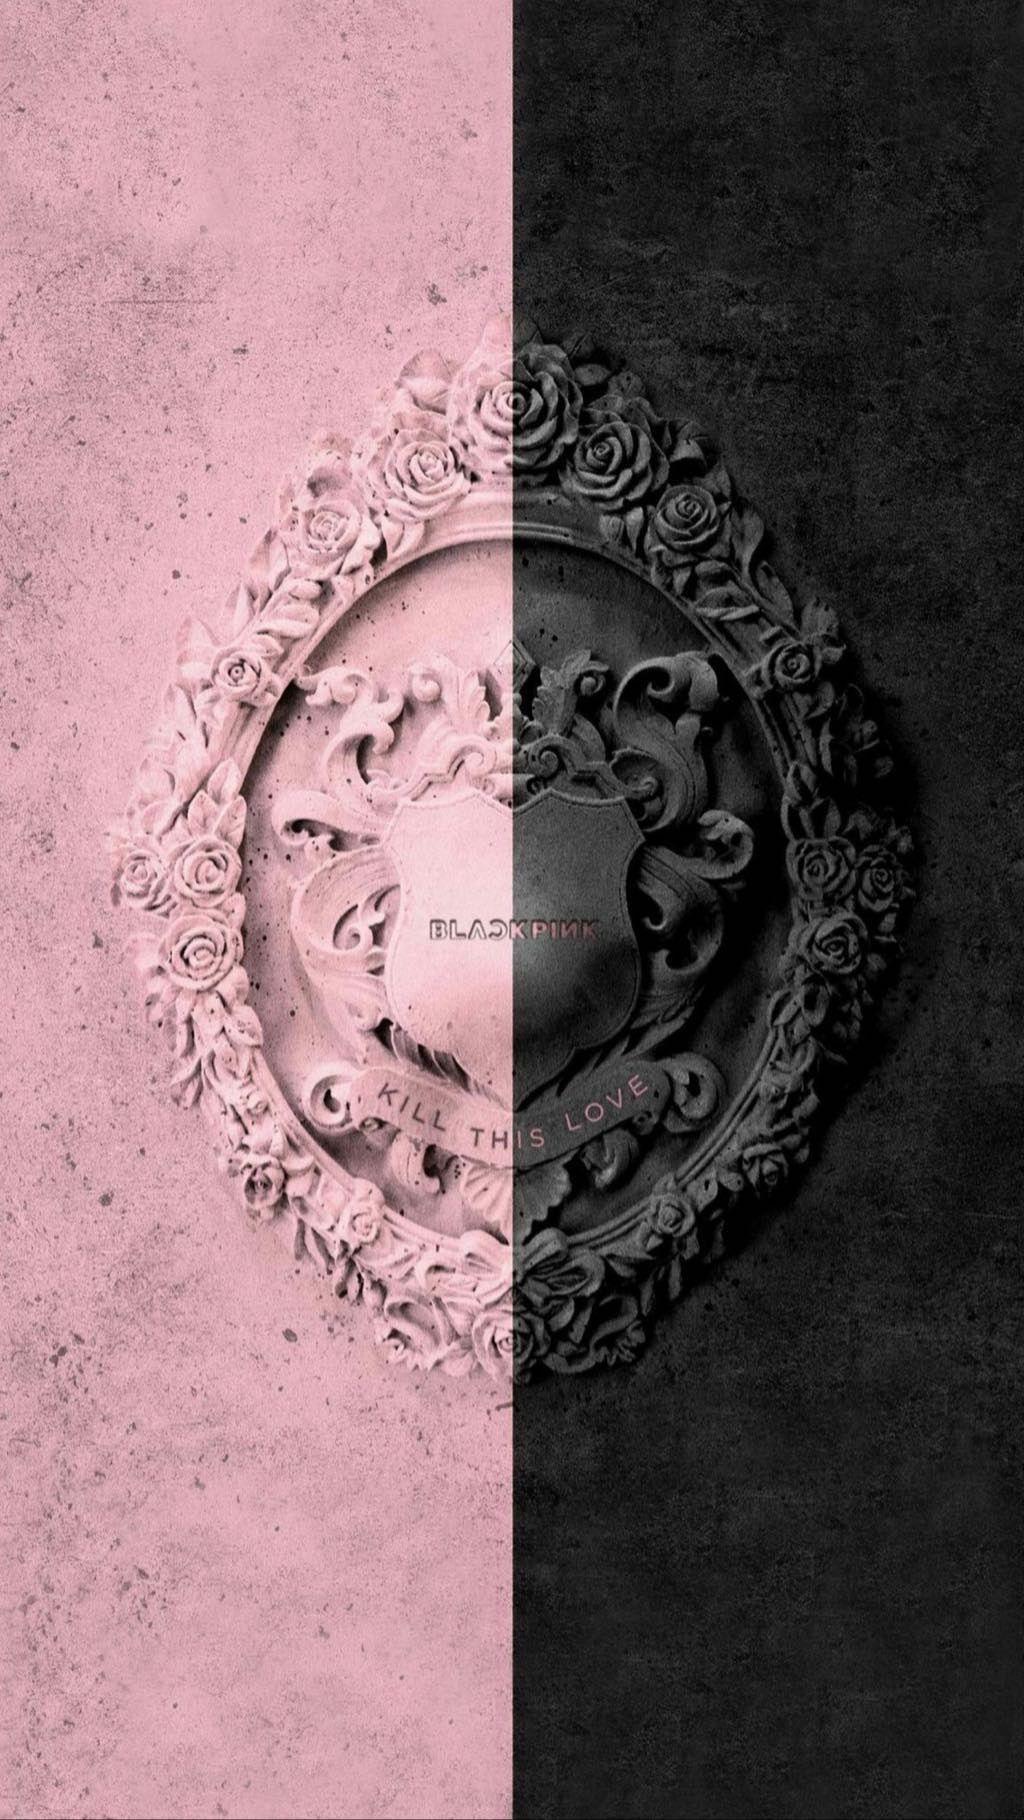 Pin By Ginknova Co Th On Blackpink Blackpink Rose Black Pink Kpop Blackpink